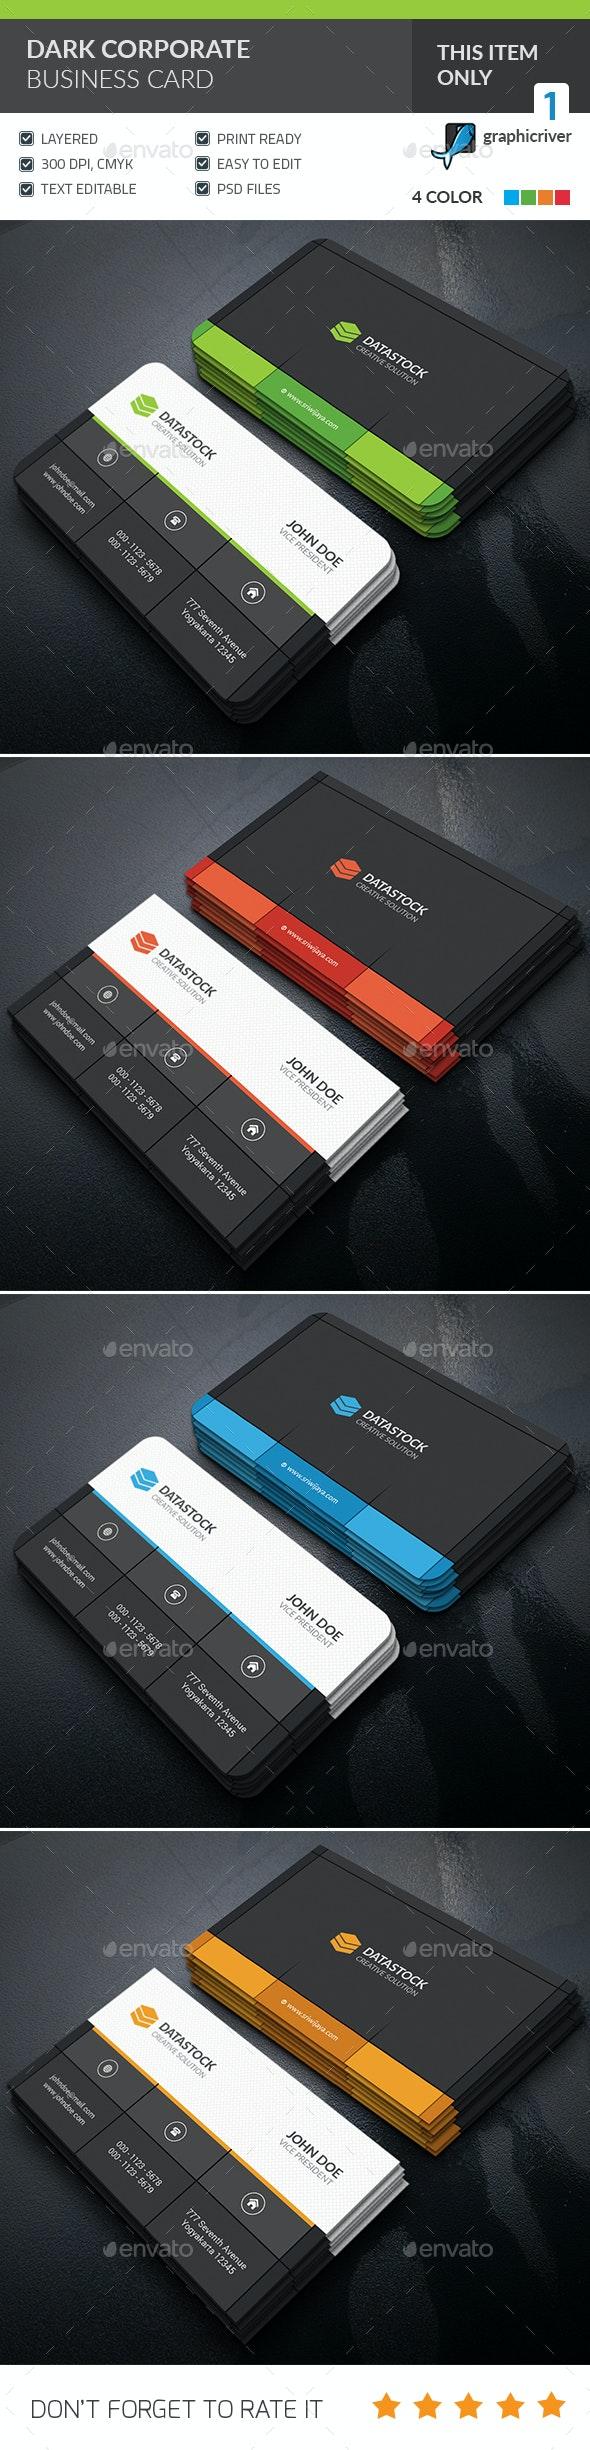 Dark Corporate Business Card - Corporate Business Cards